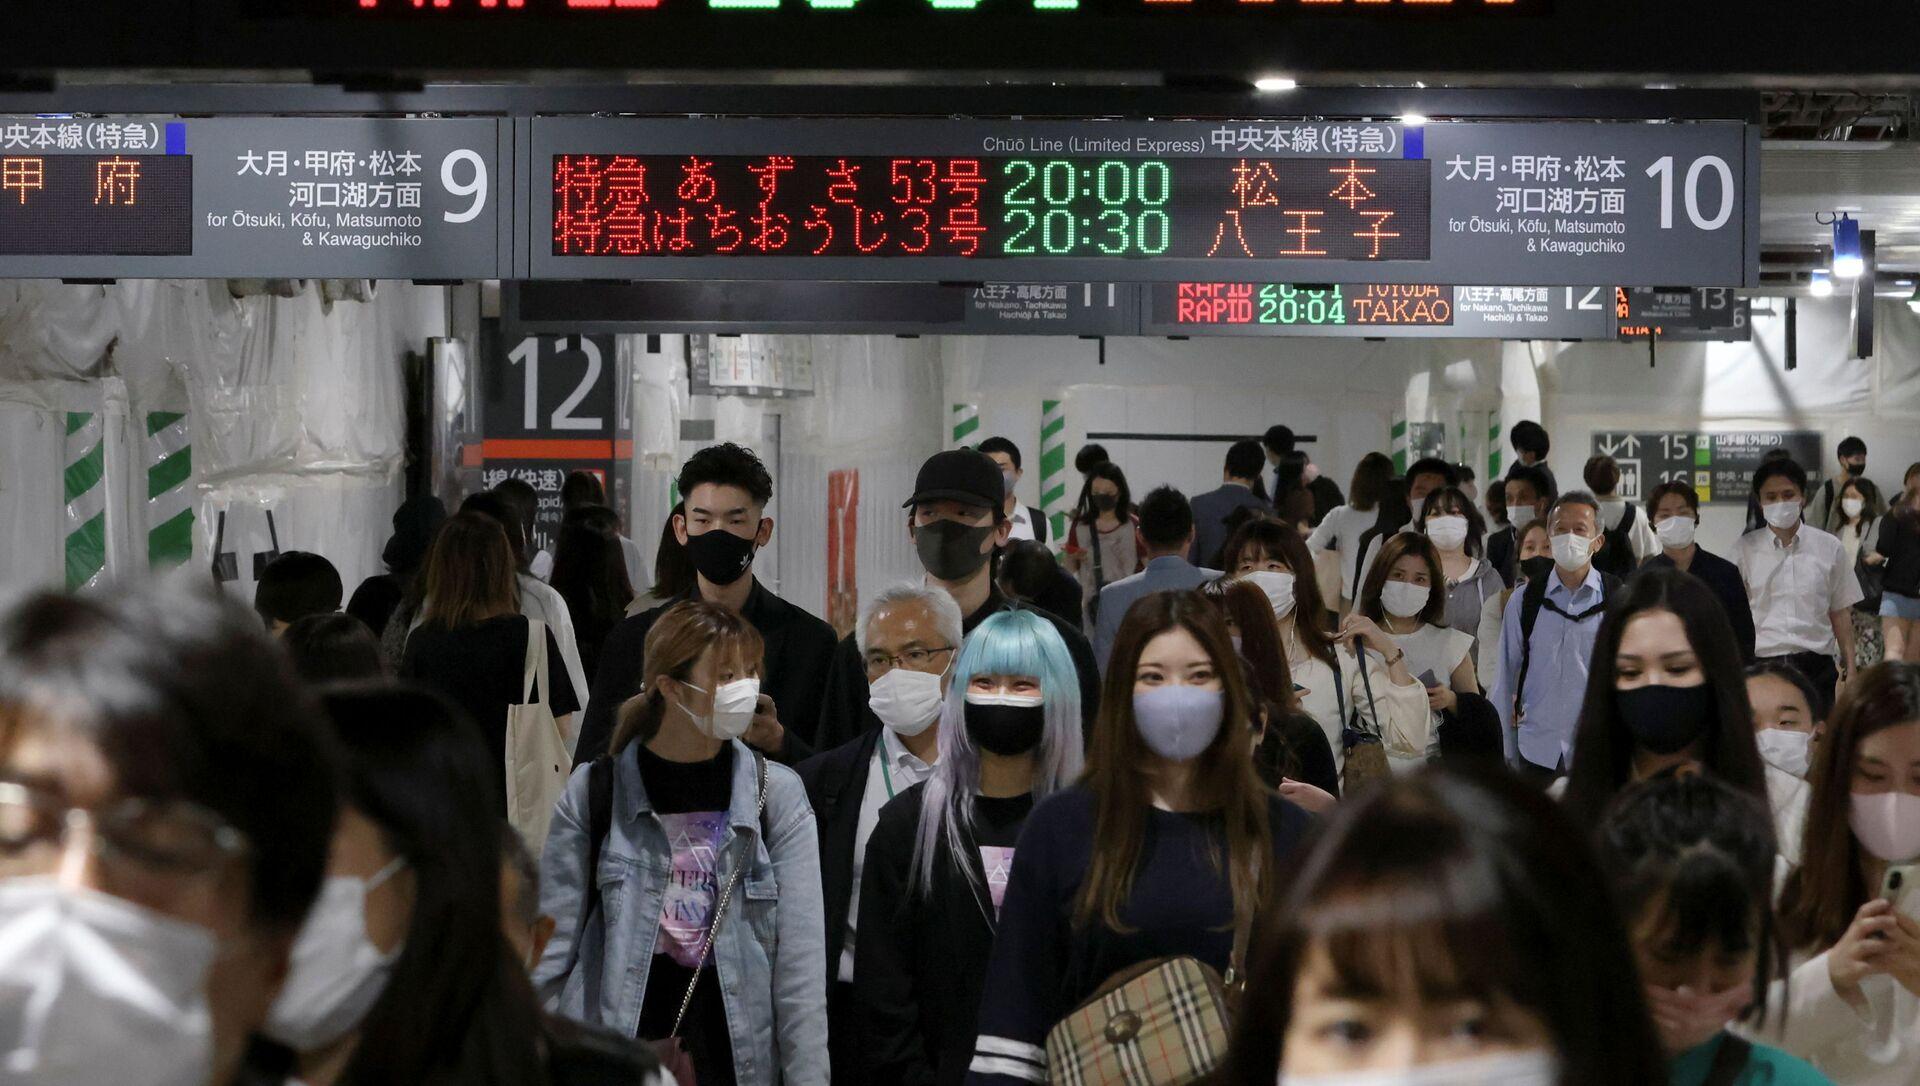 Commuters wearing protective face masks walk at a train station, amid the coronavirus disease (COVID-19) pandemic, in Tokyo - Sputnik International, 1920, 30.07.2021